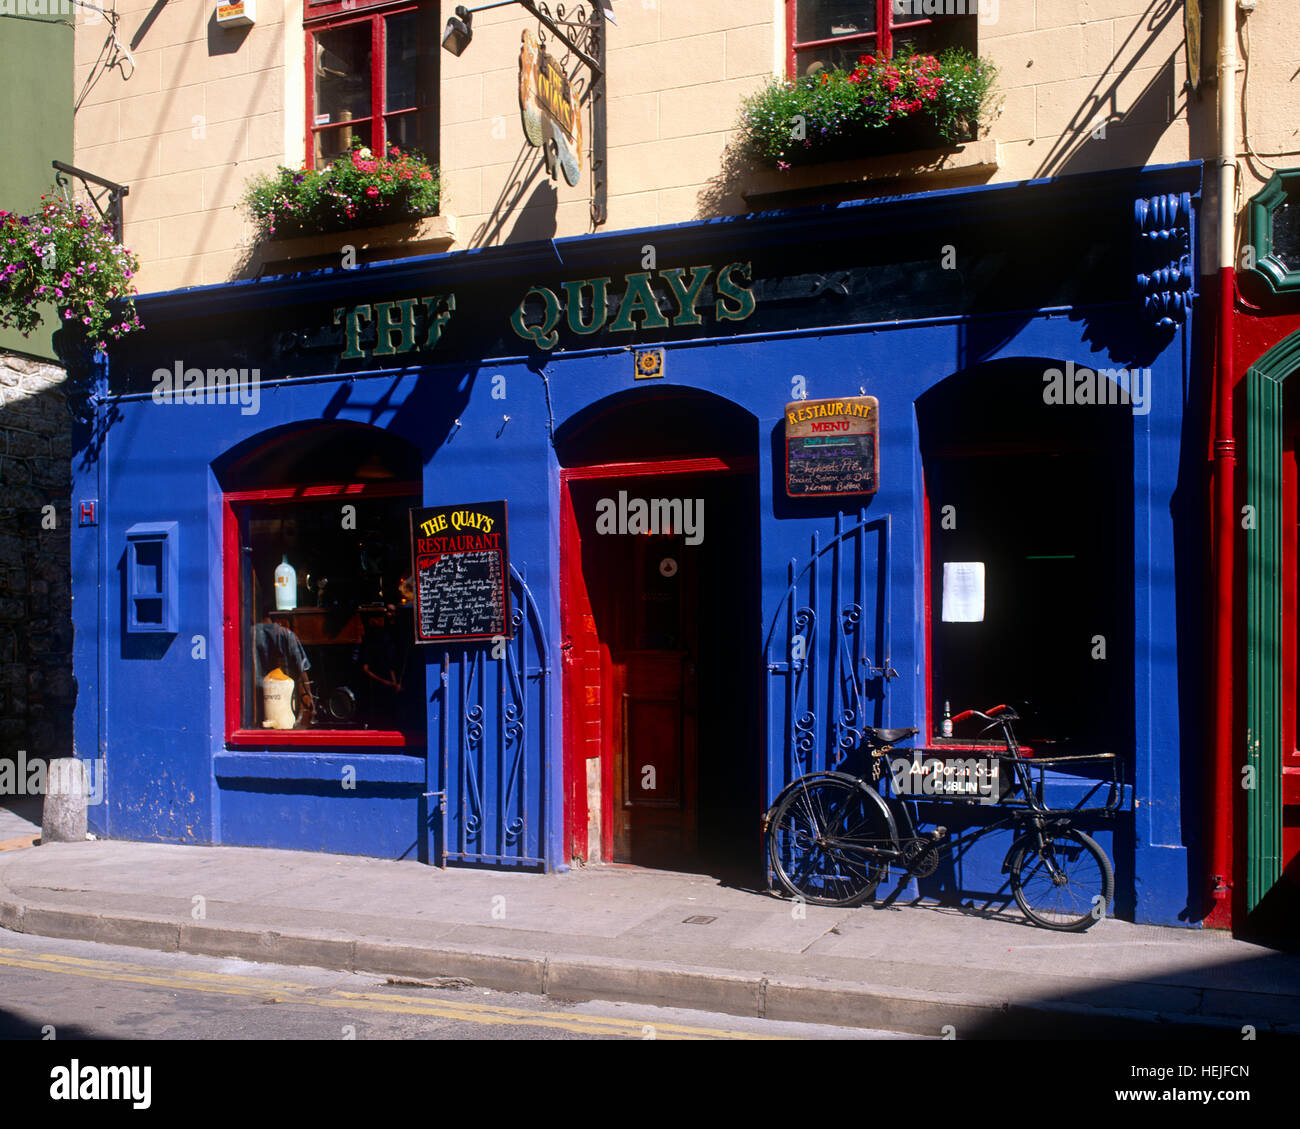 Quay Street, Galway, County Galway, Ireland - Stock Image